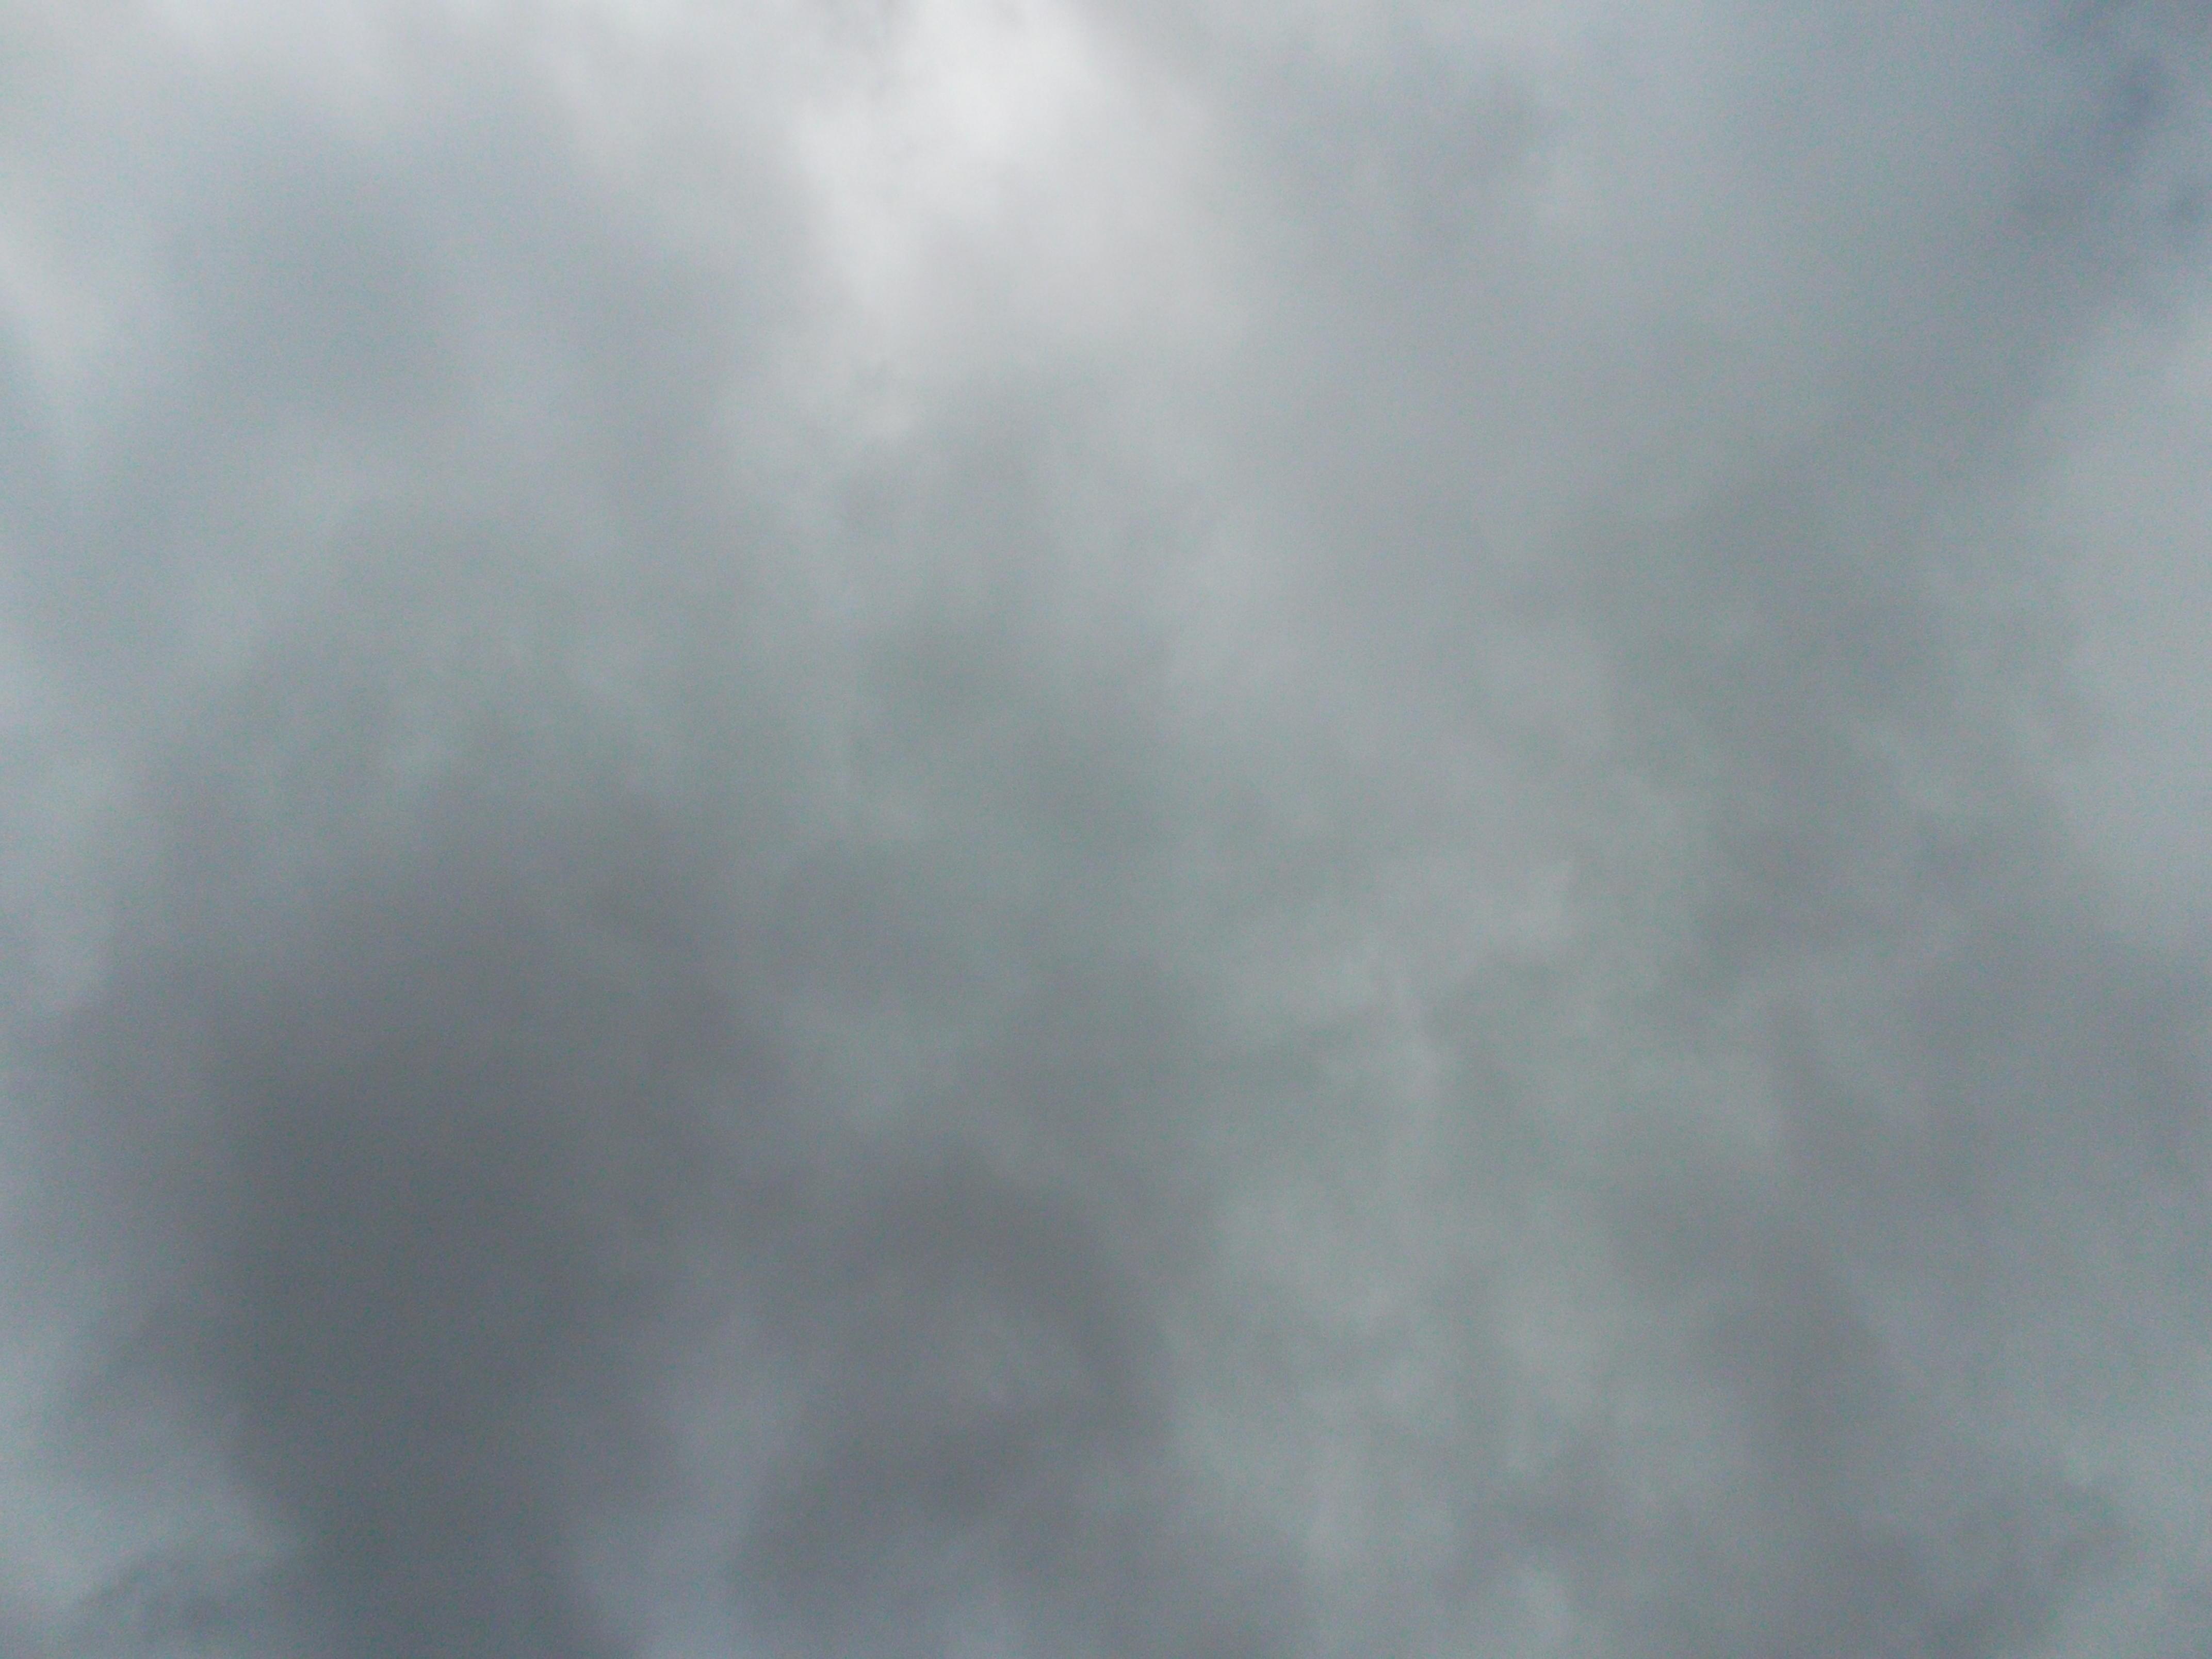 2013-06-11 Longitude -0.371 Latitude 49.182 Altitude 29 Heure 11h54